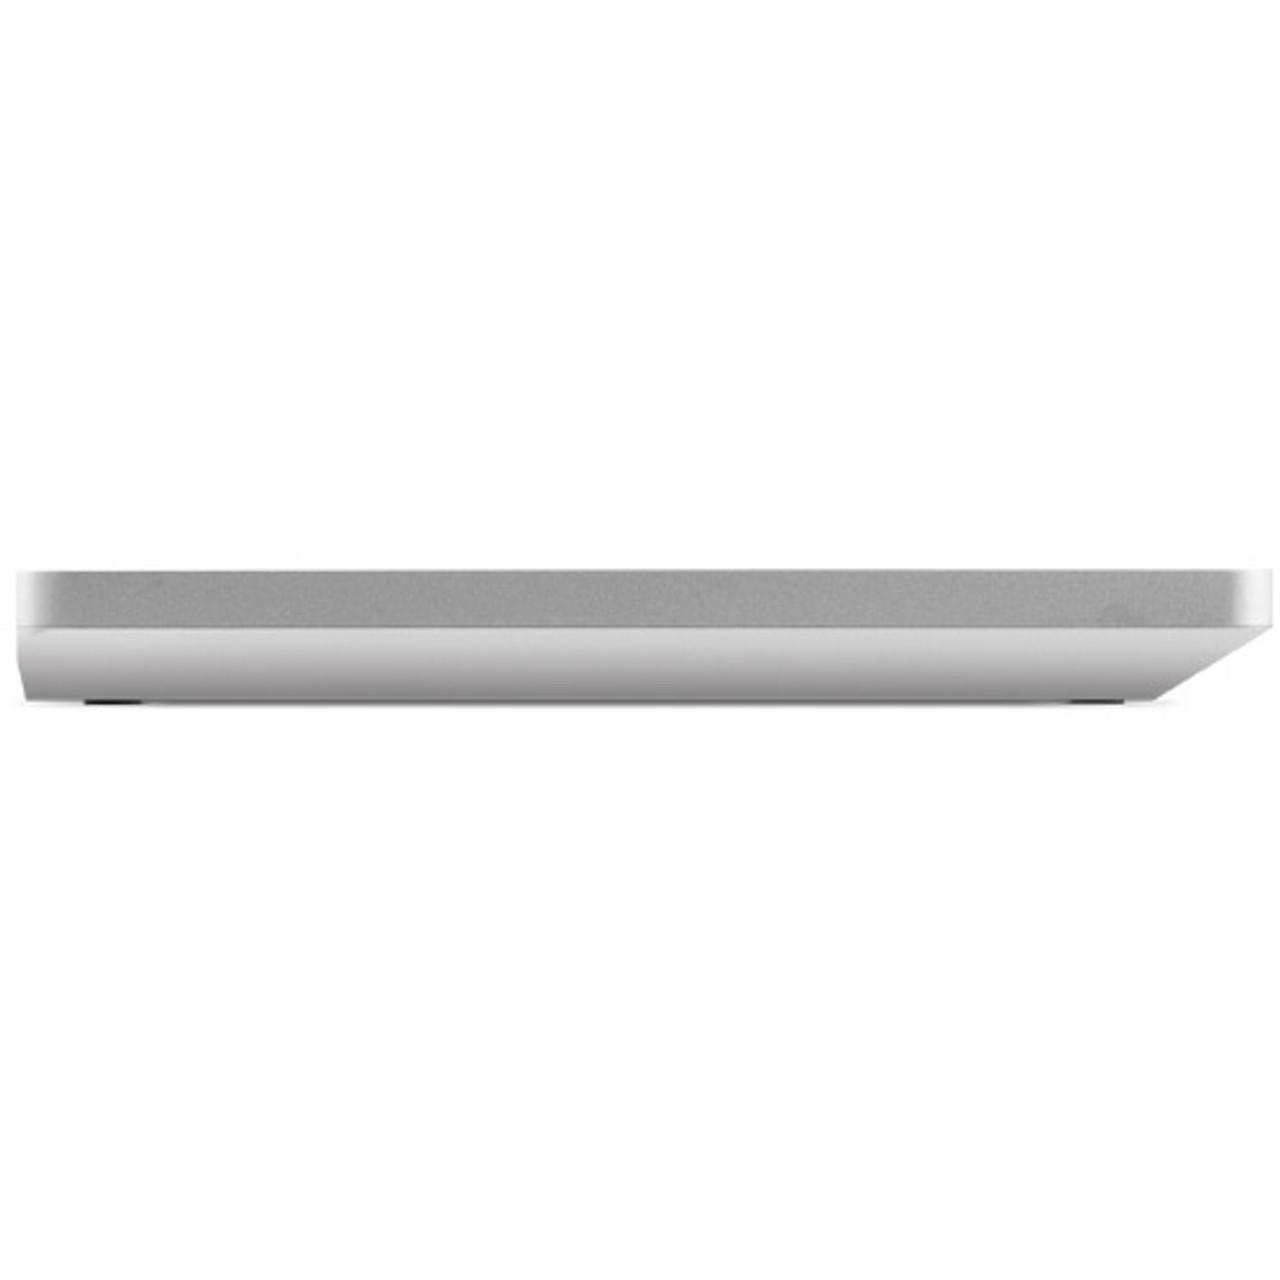 OWC Envoy Pro Portable, Bus-Powered USB 3.0 Enclosure For Apple Flash SSDs